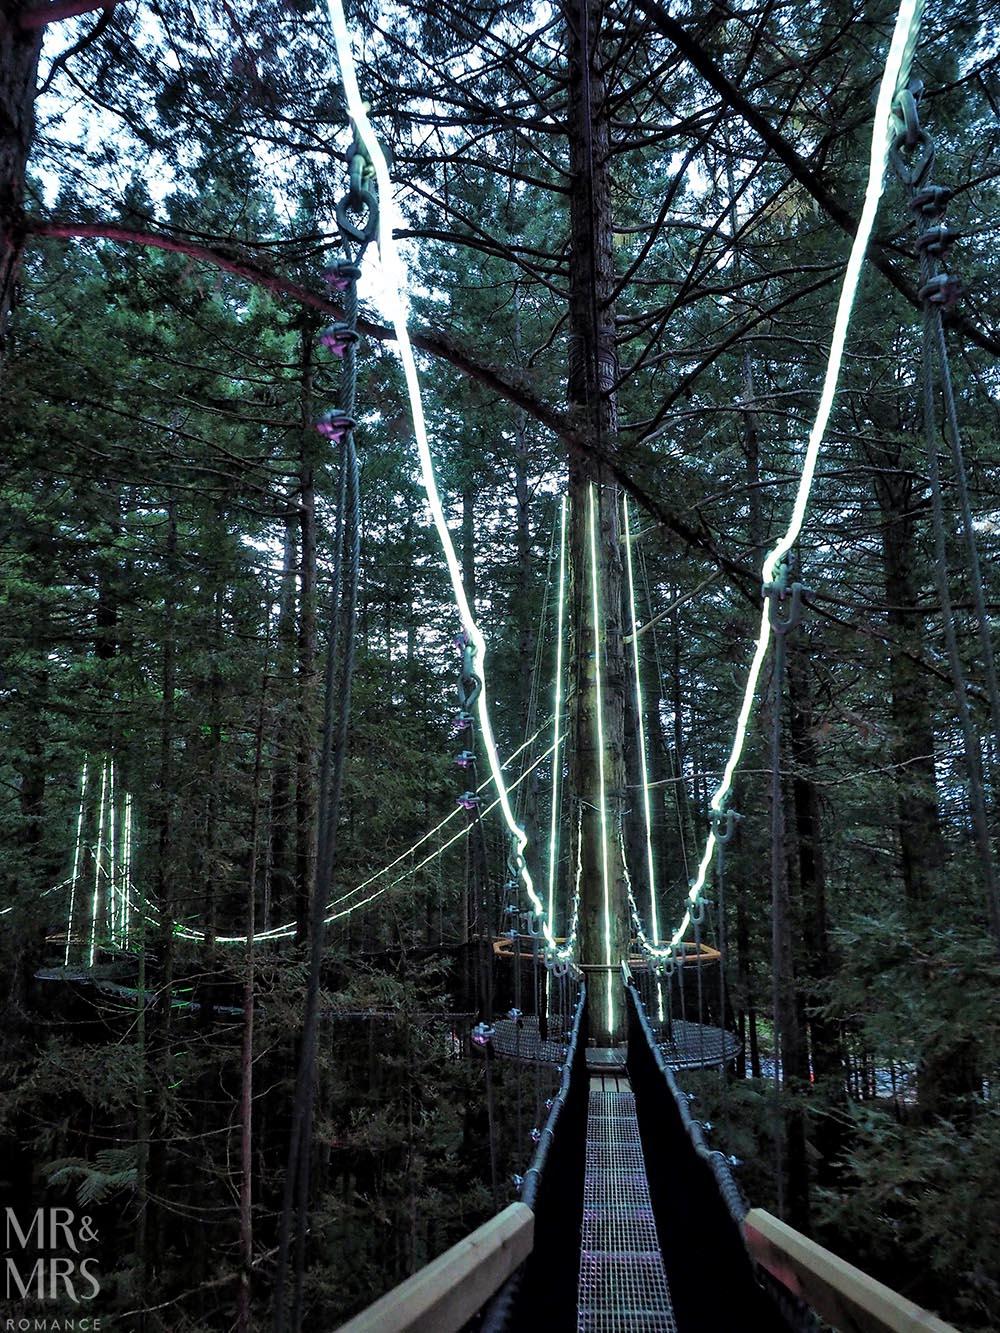 Redwoods Treewalk, Rotorua, New Zealand - lit-up walkways